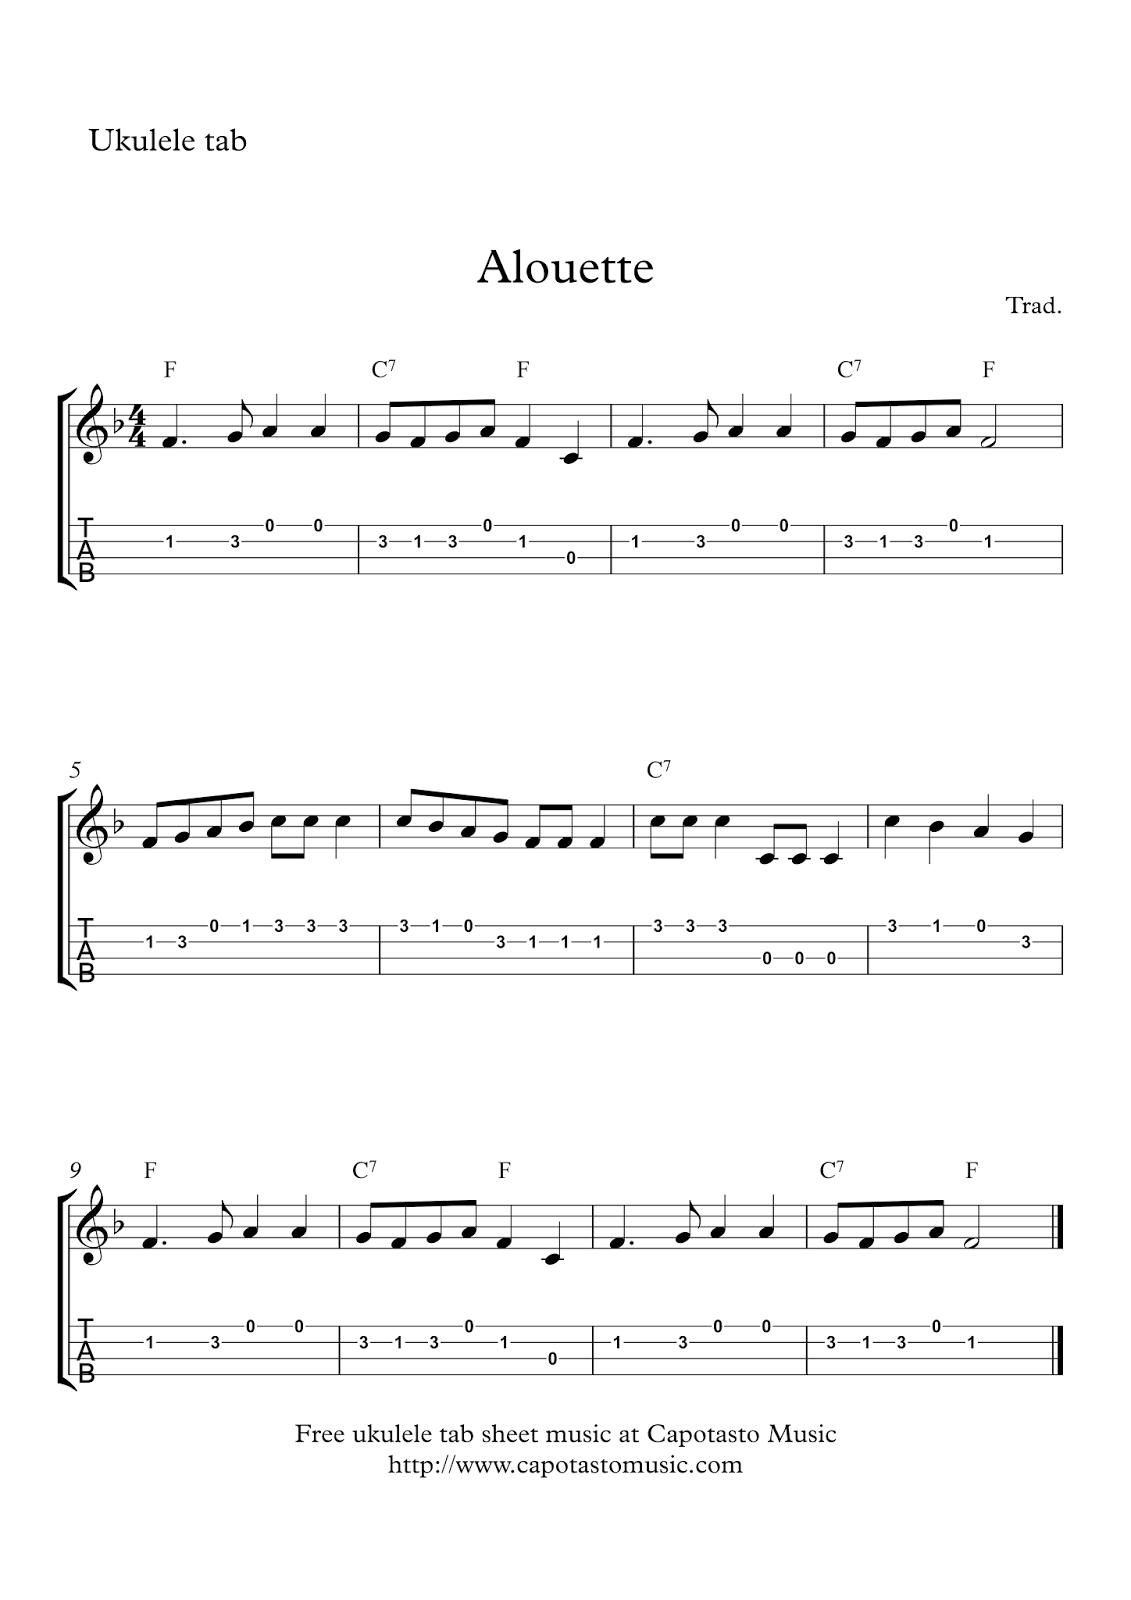 Alouette | Free easy ukulele tab sheet music | Uke in 2019